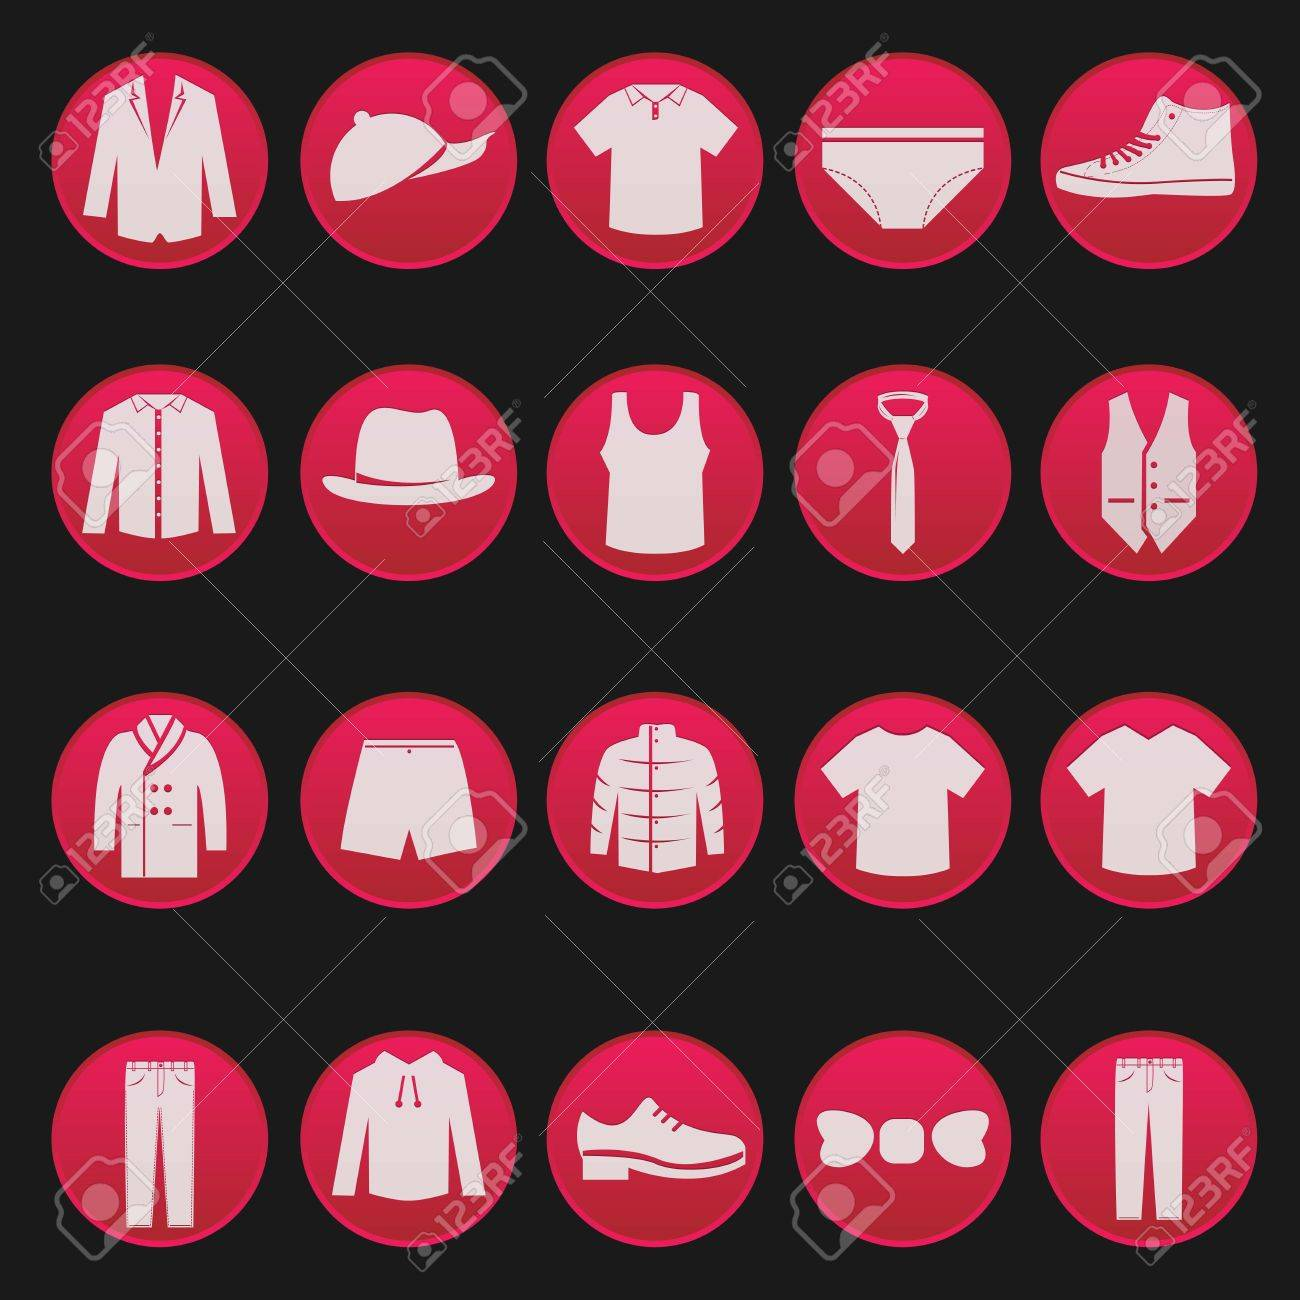 men clothing fashion item set series 2 Stock Vector - 18069978